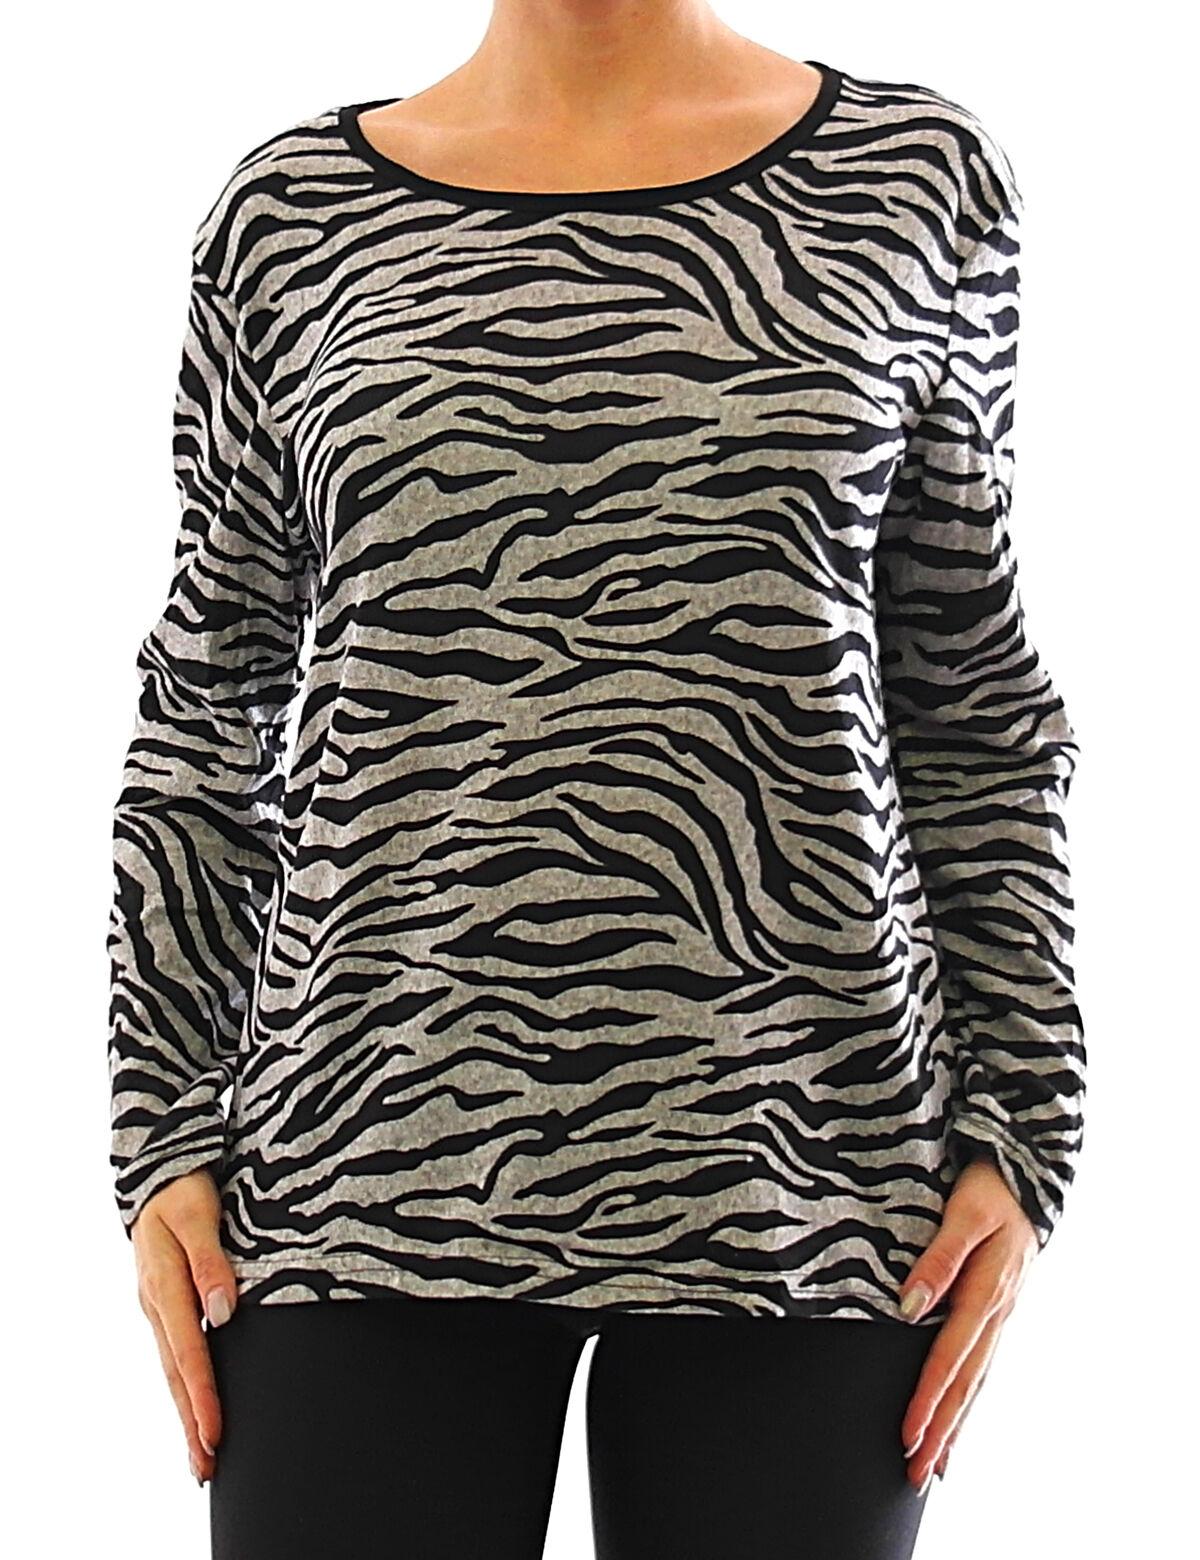 official photos 13433 301e0 Damen Langarm Shirt Pullover Tiger Muster Bluse Stretch Tunika T-Shirt 351